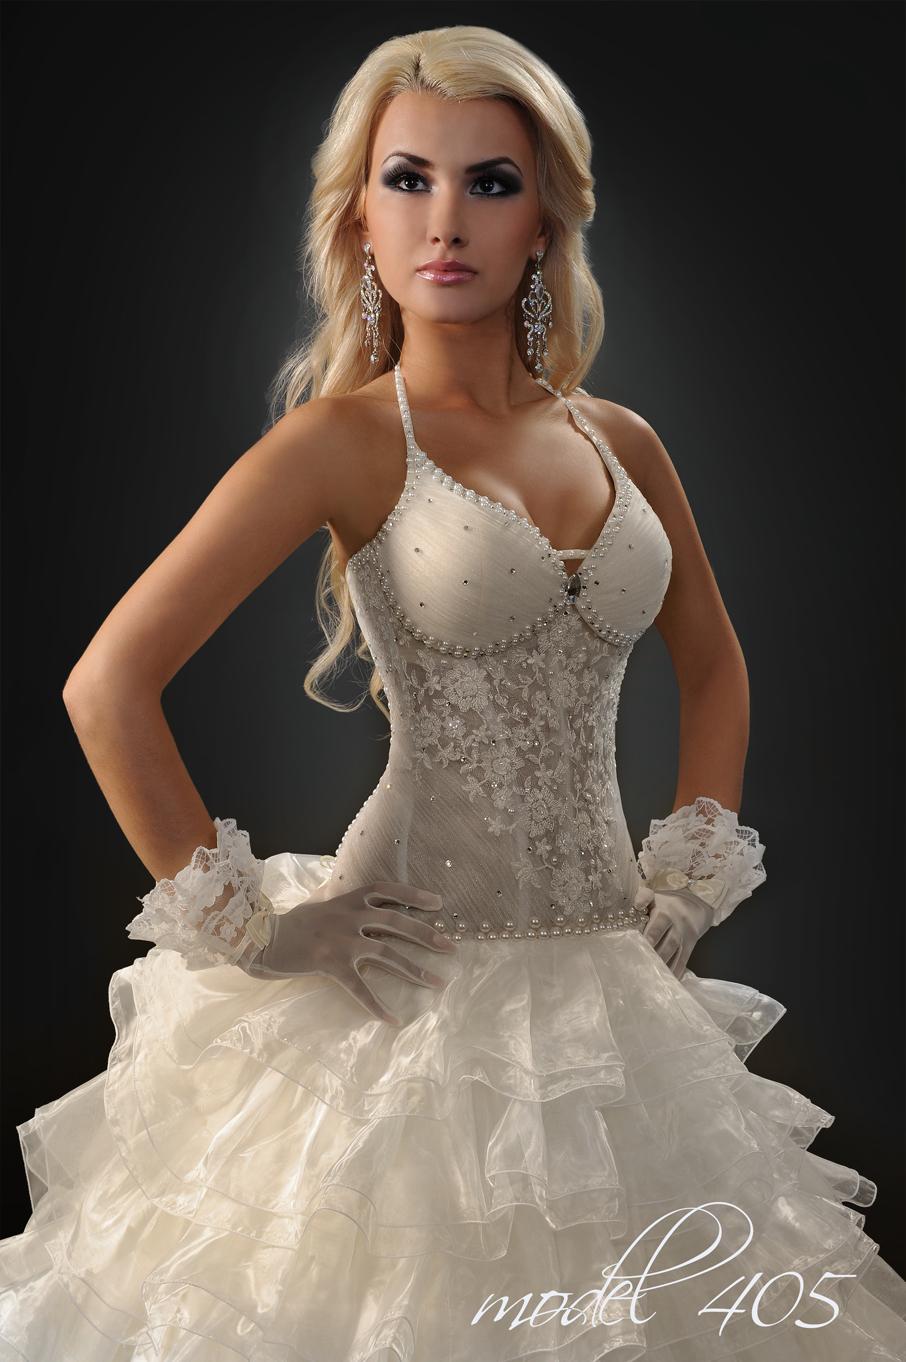 فروش لباس عروس اينترنتي